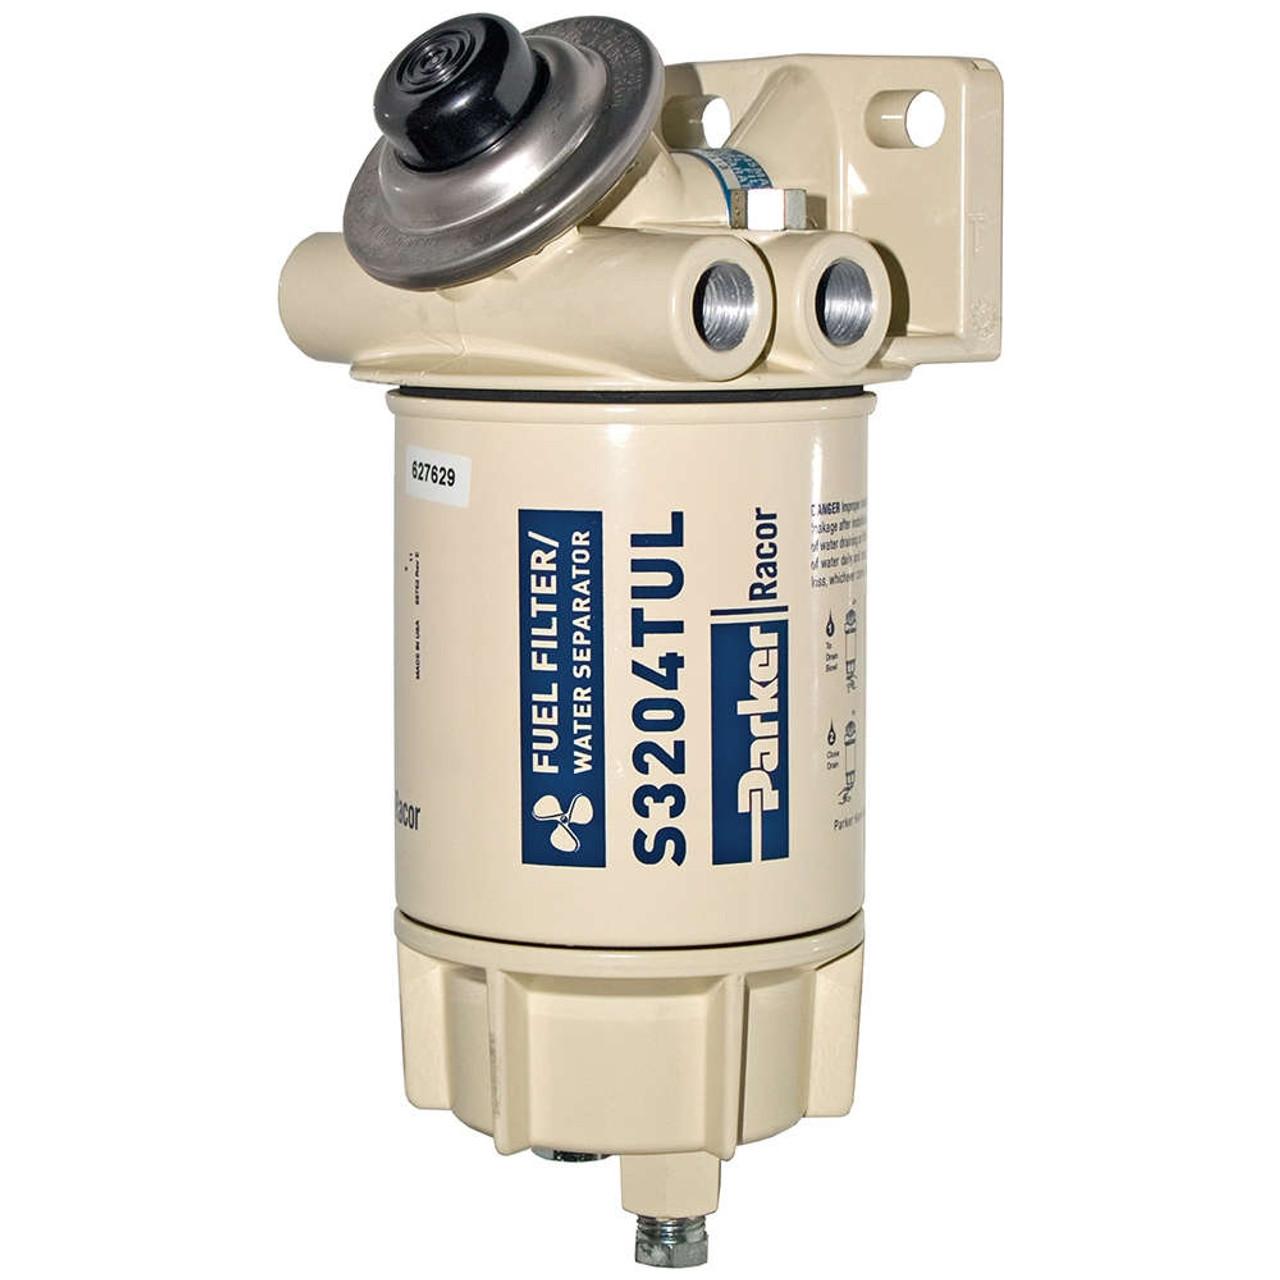 medium resolution of racor aquabloc marine 3 8 in 45 gph spin on diesel fuel filterracor aquabloc marine 3 8 in 45 gph spin on diesel fuel filter water separator assembly 6 qty